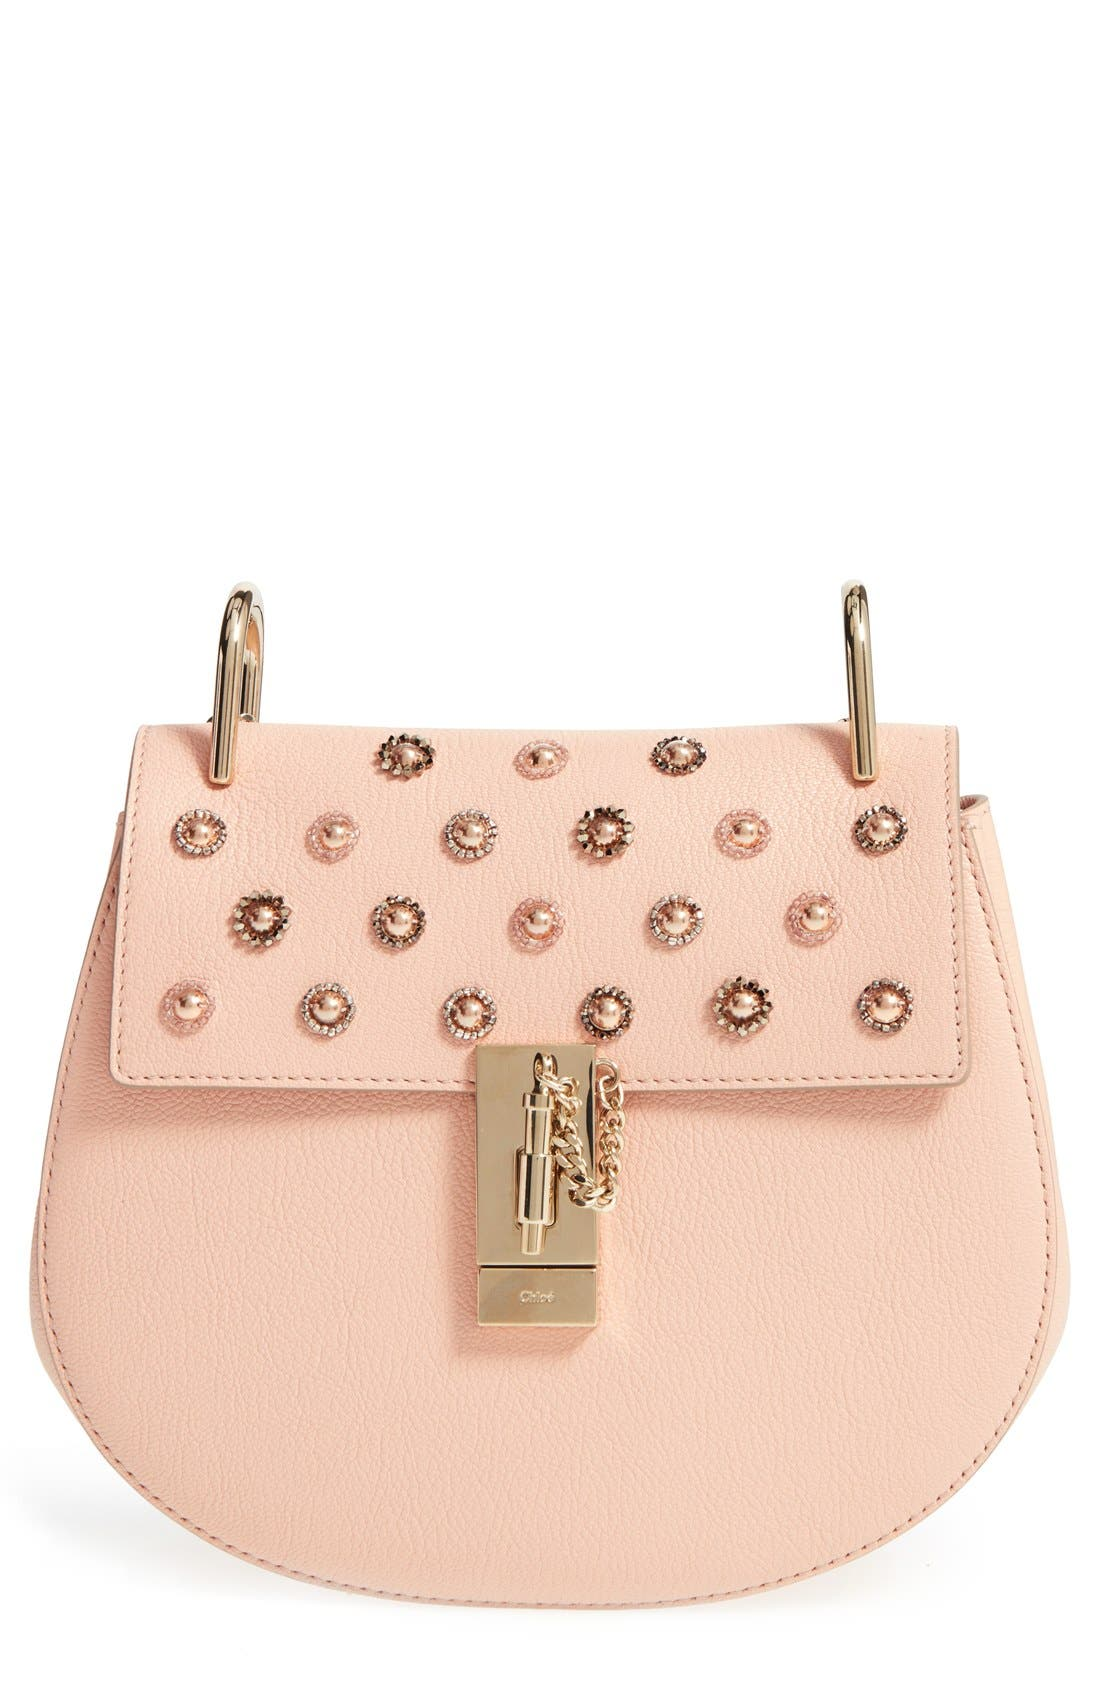 Alternate Image 1 Selected - Chloé 'Small Drew' Goatskin Leather Shoulder Bag